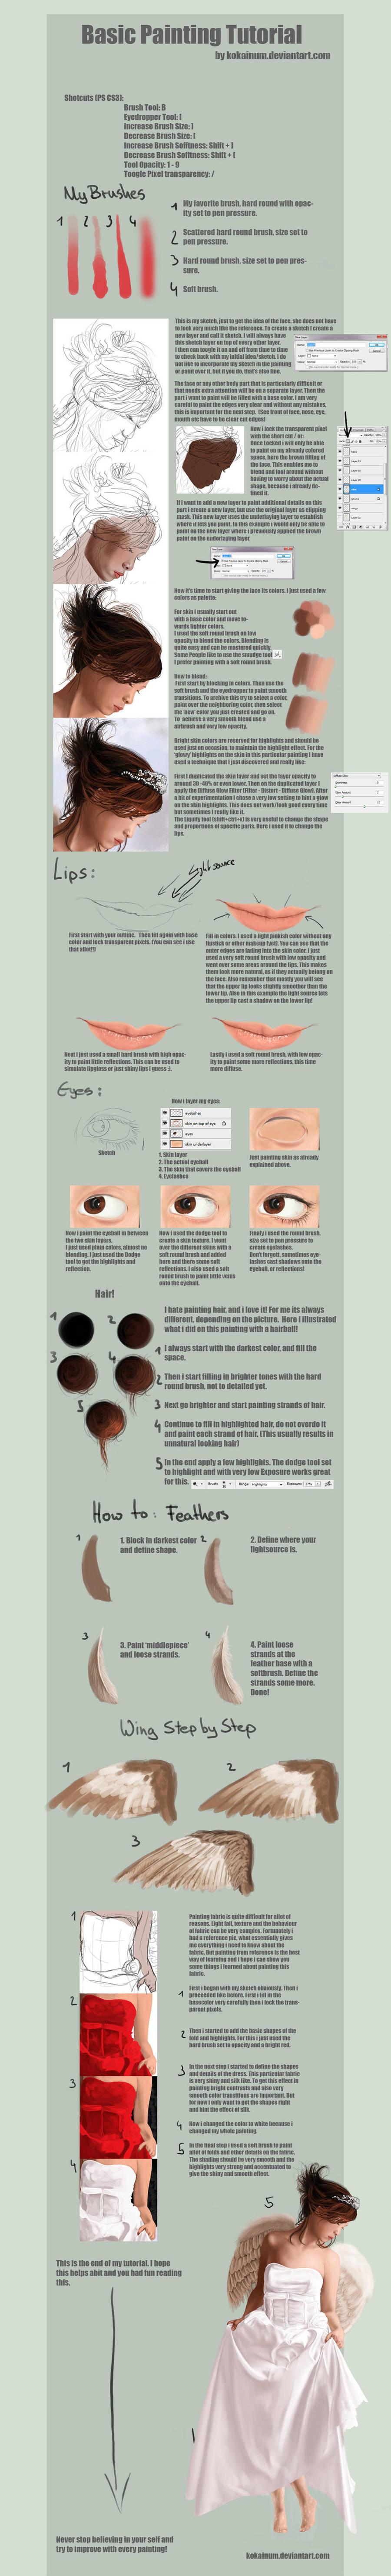 Basic PS Painting Tutorial by kokaInum